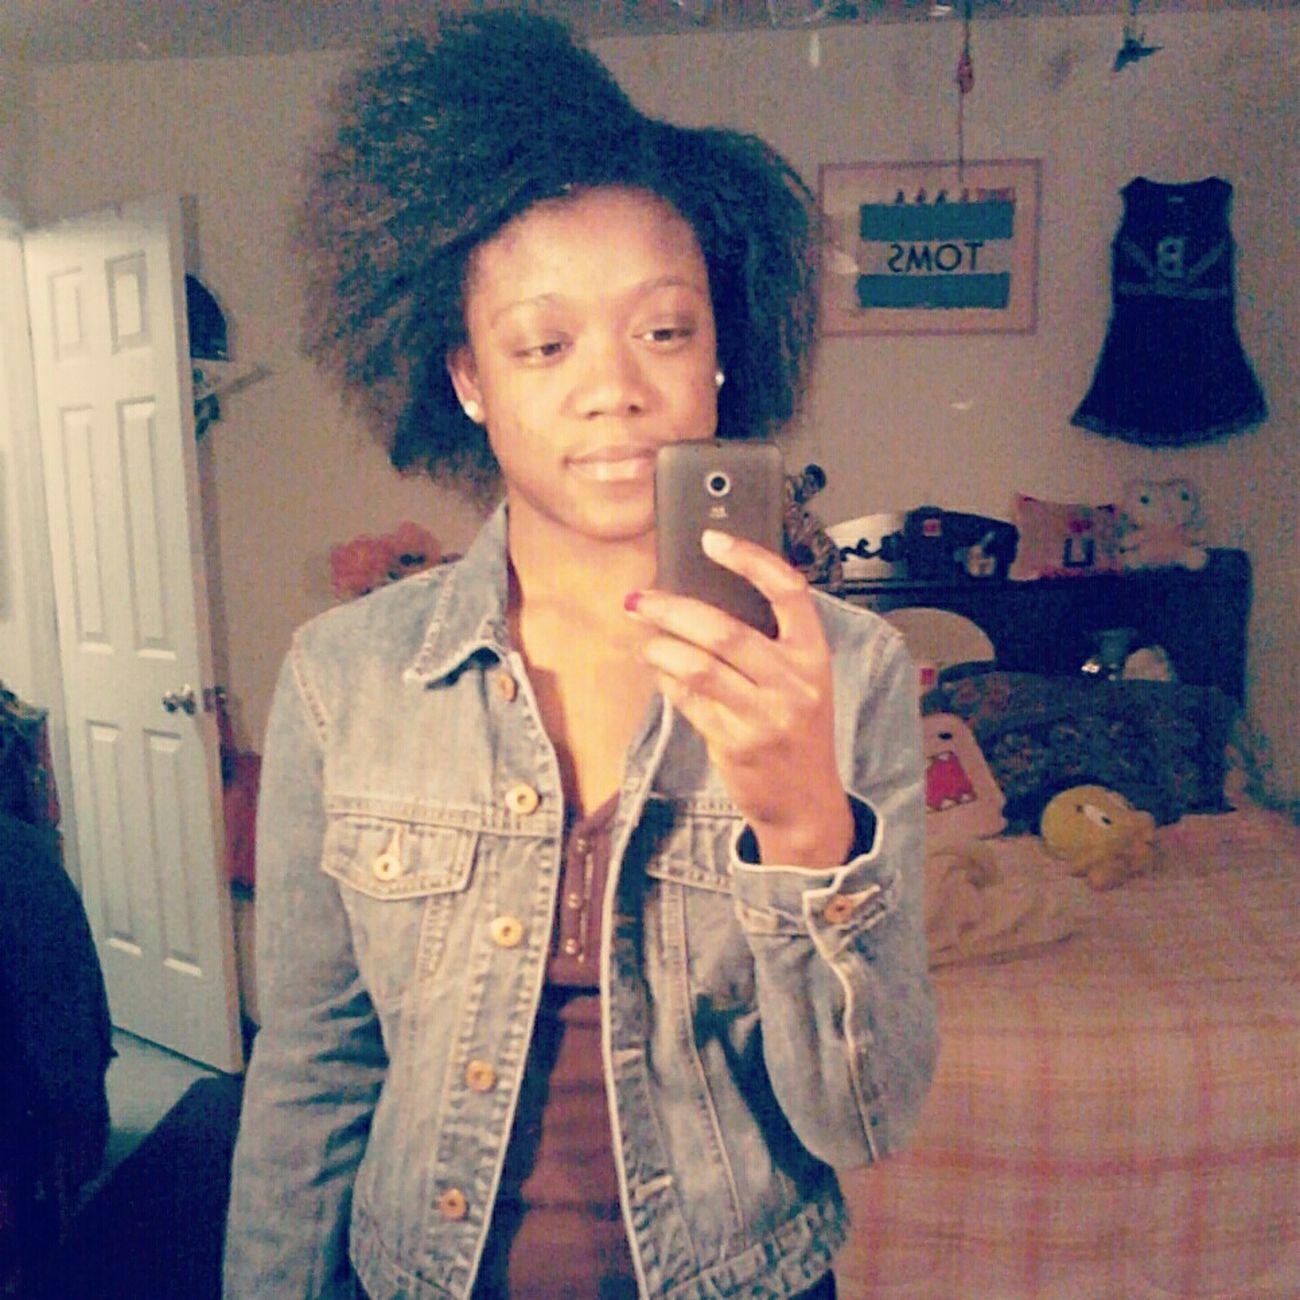 Thick hair don't care lol Thick Hair Don't Care! Jamaican-German Gyal